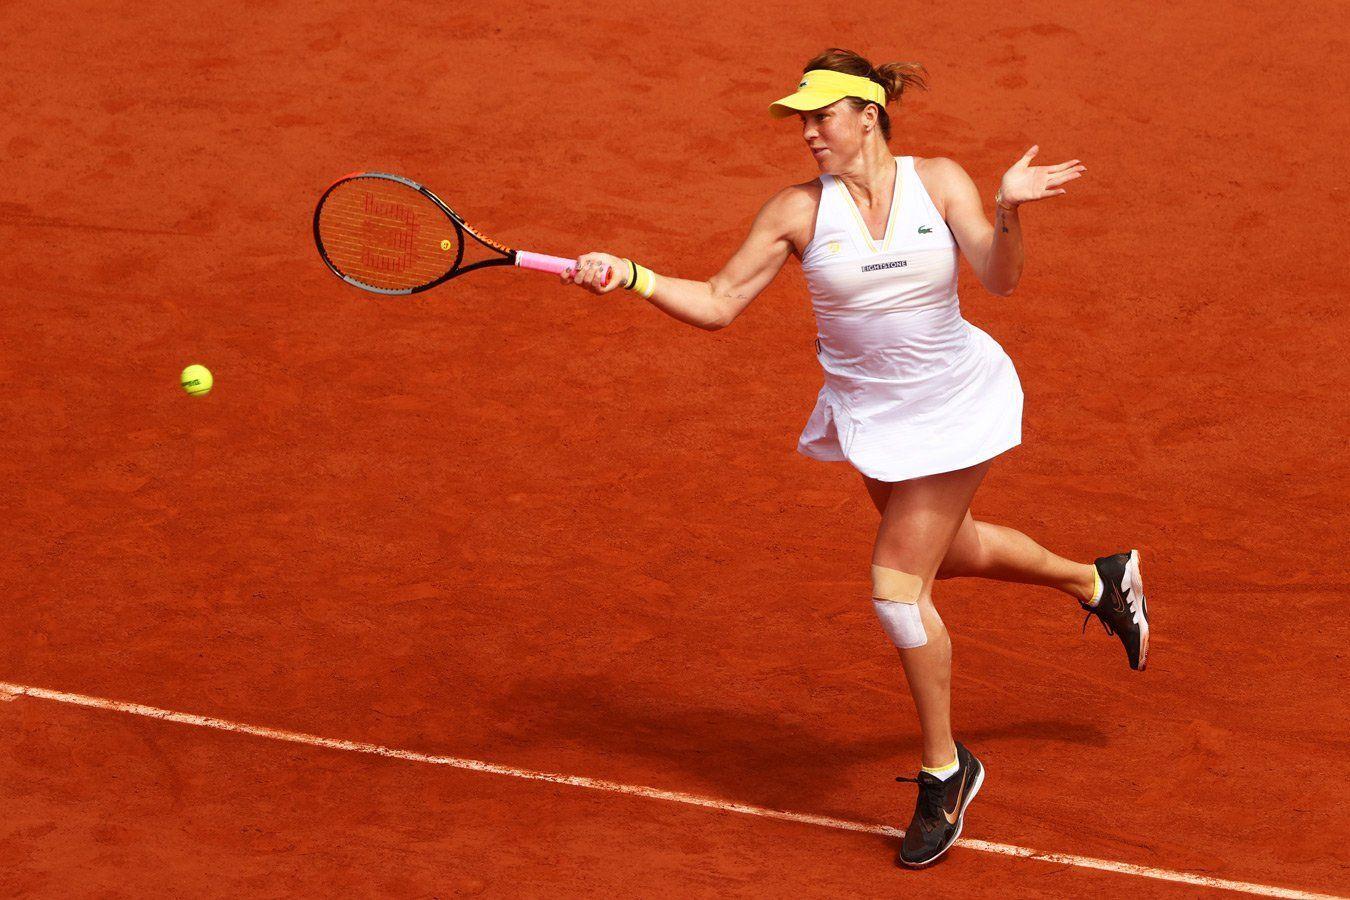 French Open 2021: Anastasia Pavlyuchenkova vs. Tamara Zidansek Tennis Pick and Prediction